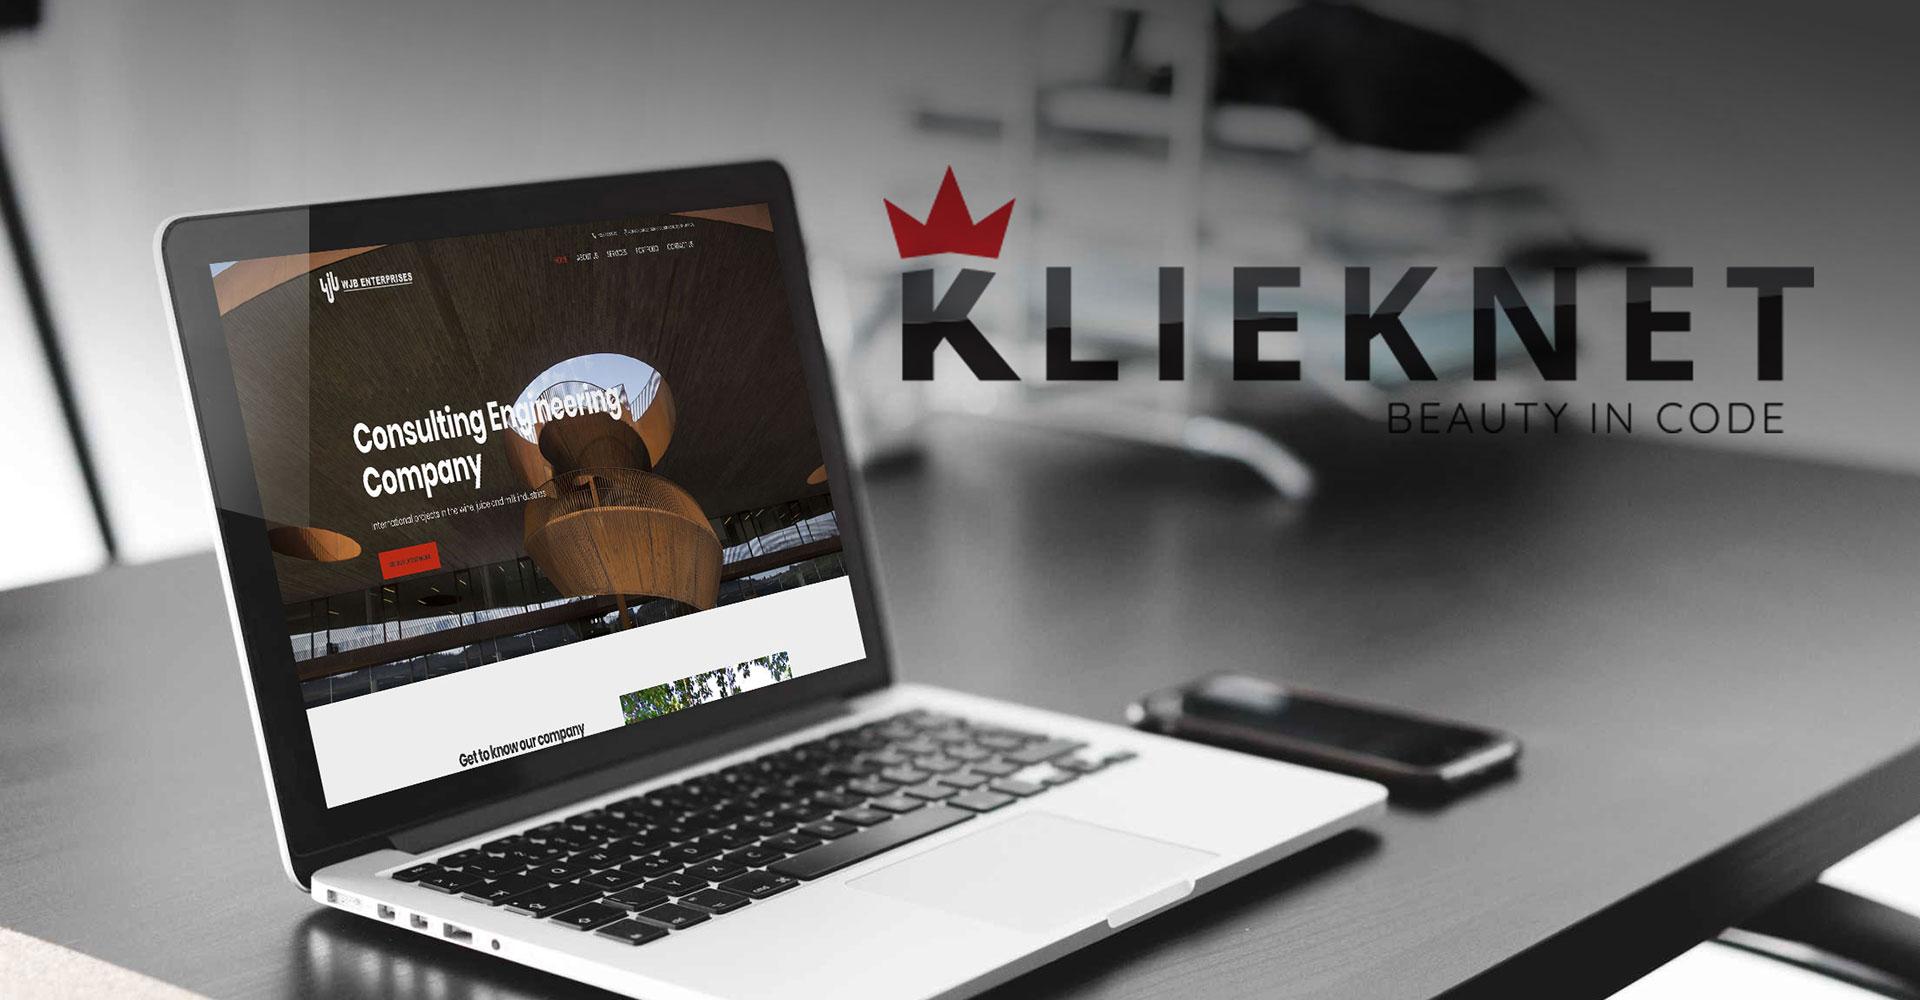 Klieknet Web Development, Design and Solutions